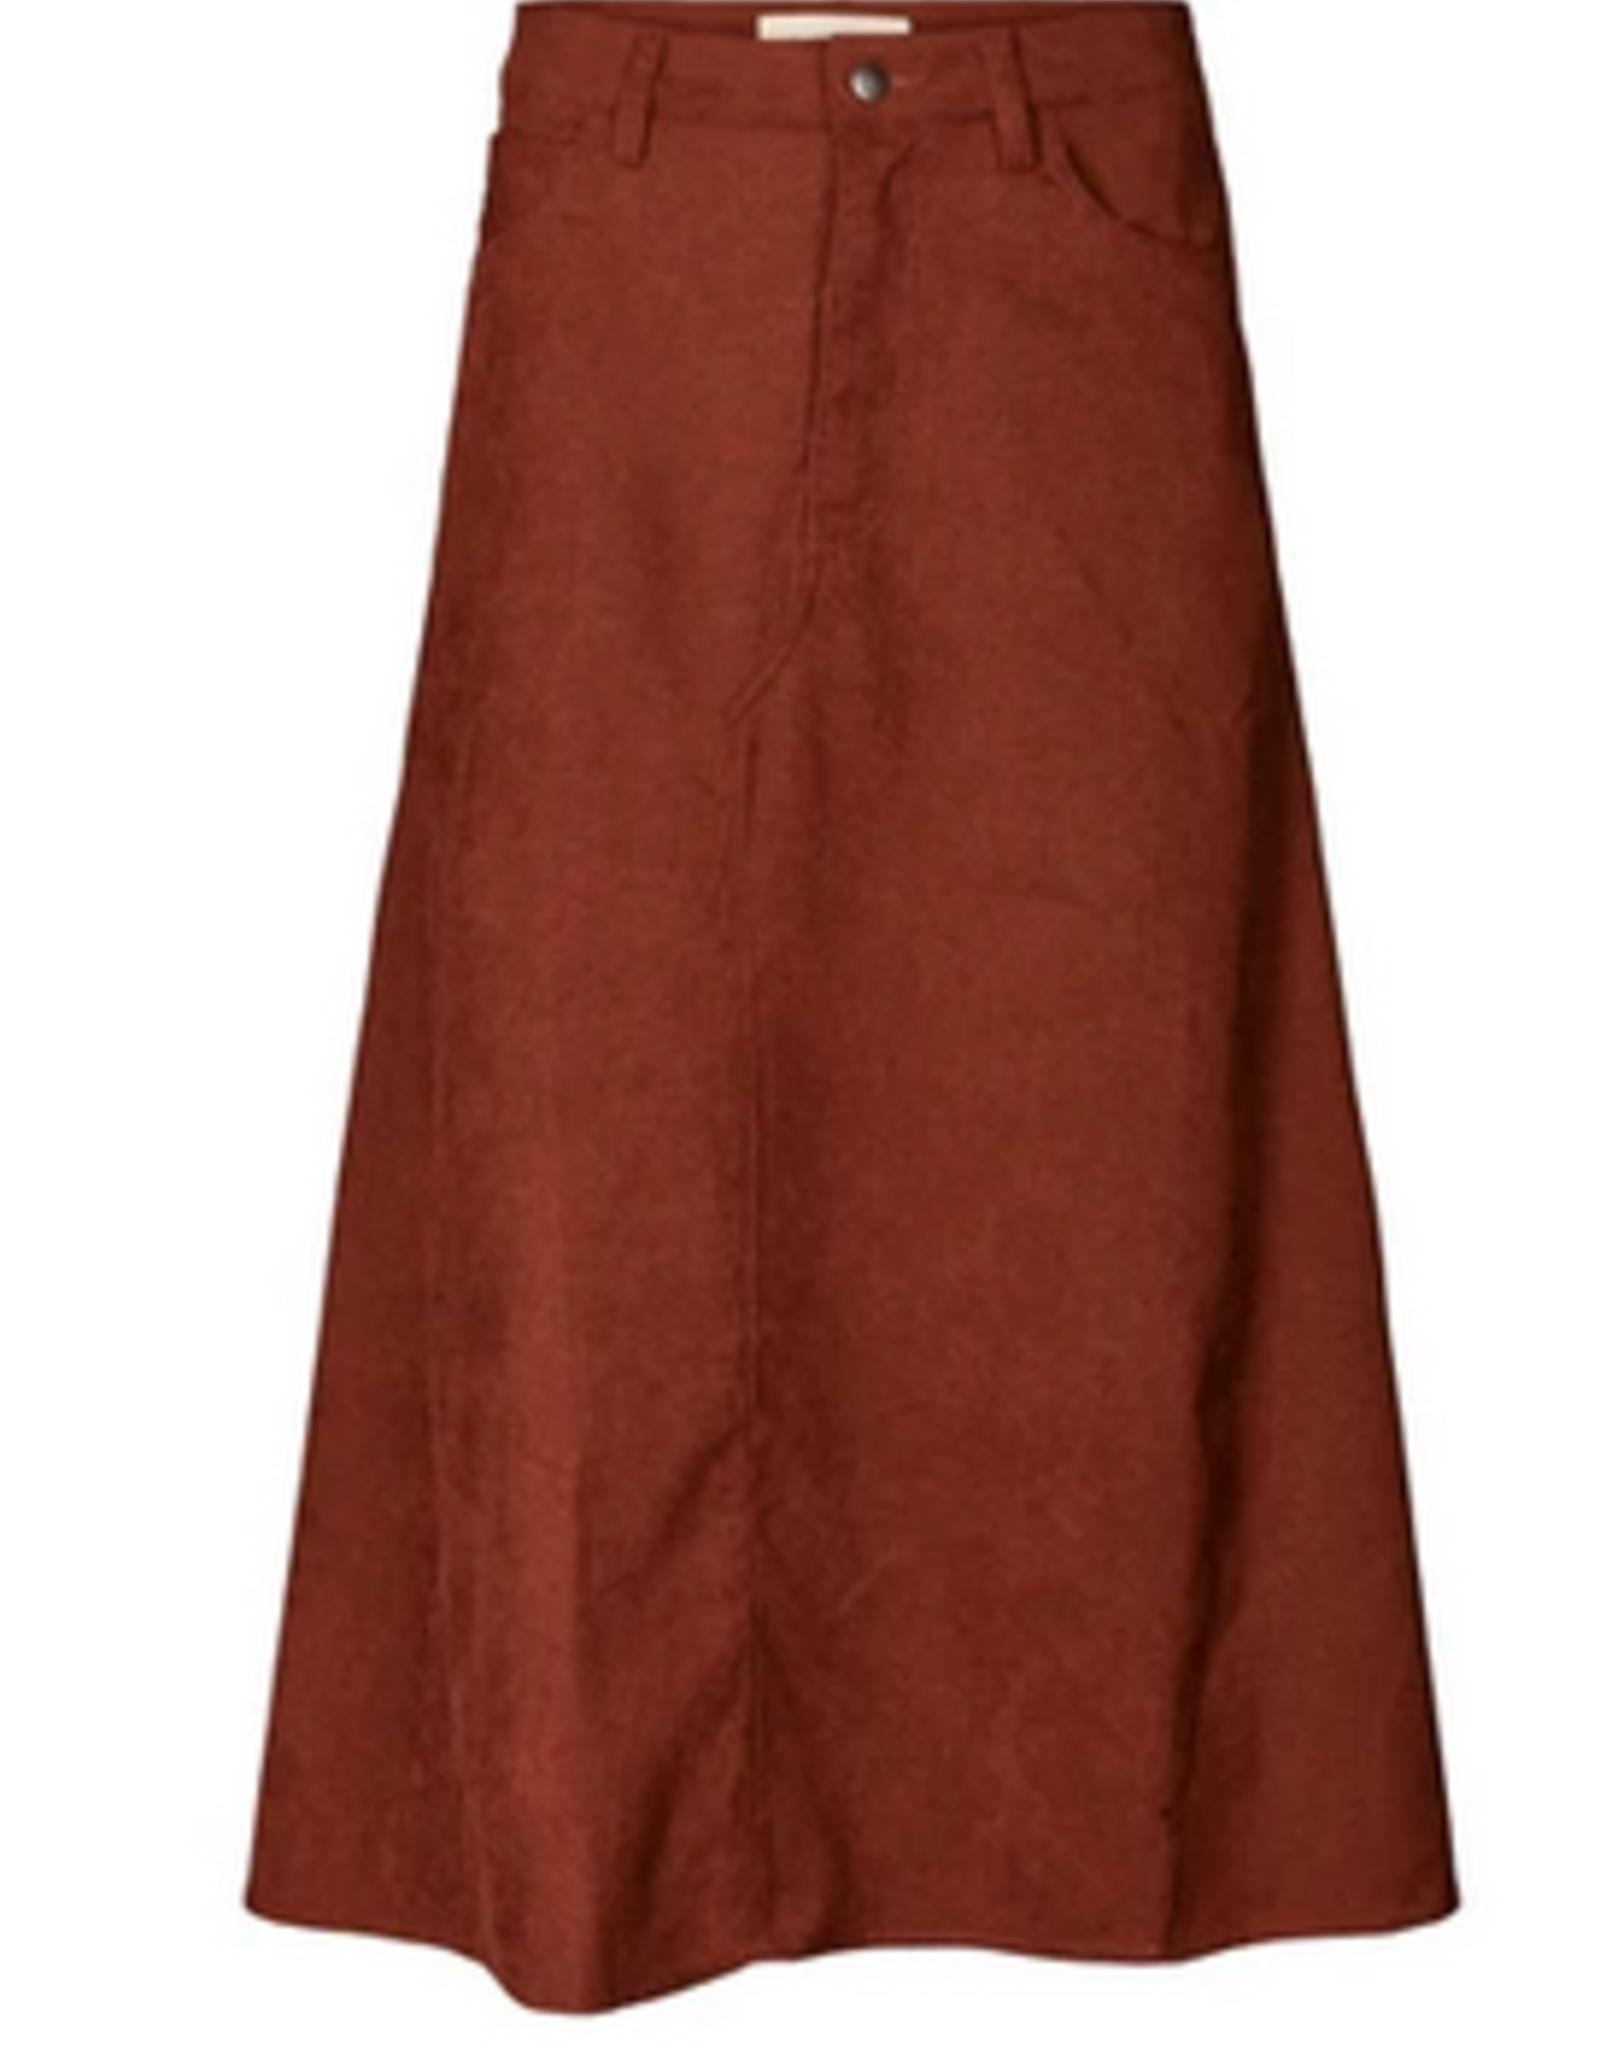 Lolly's Laundry Lolly's Laundry - Melina skirt Rust